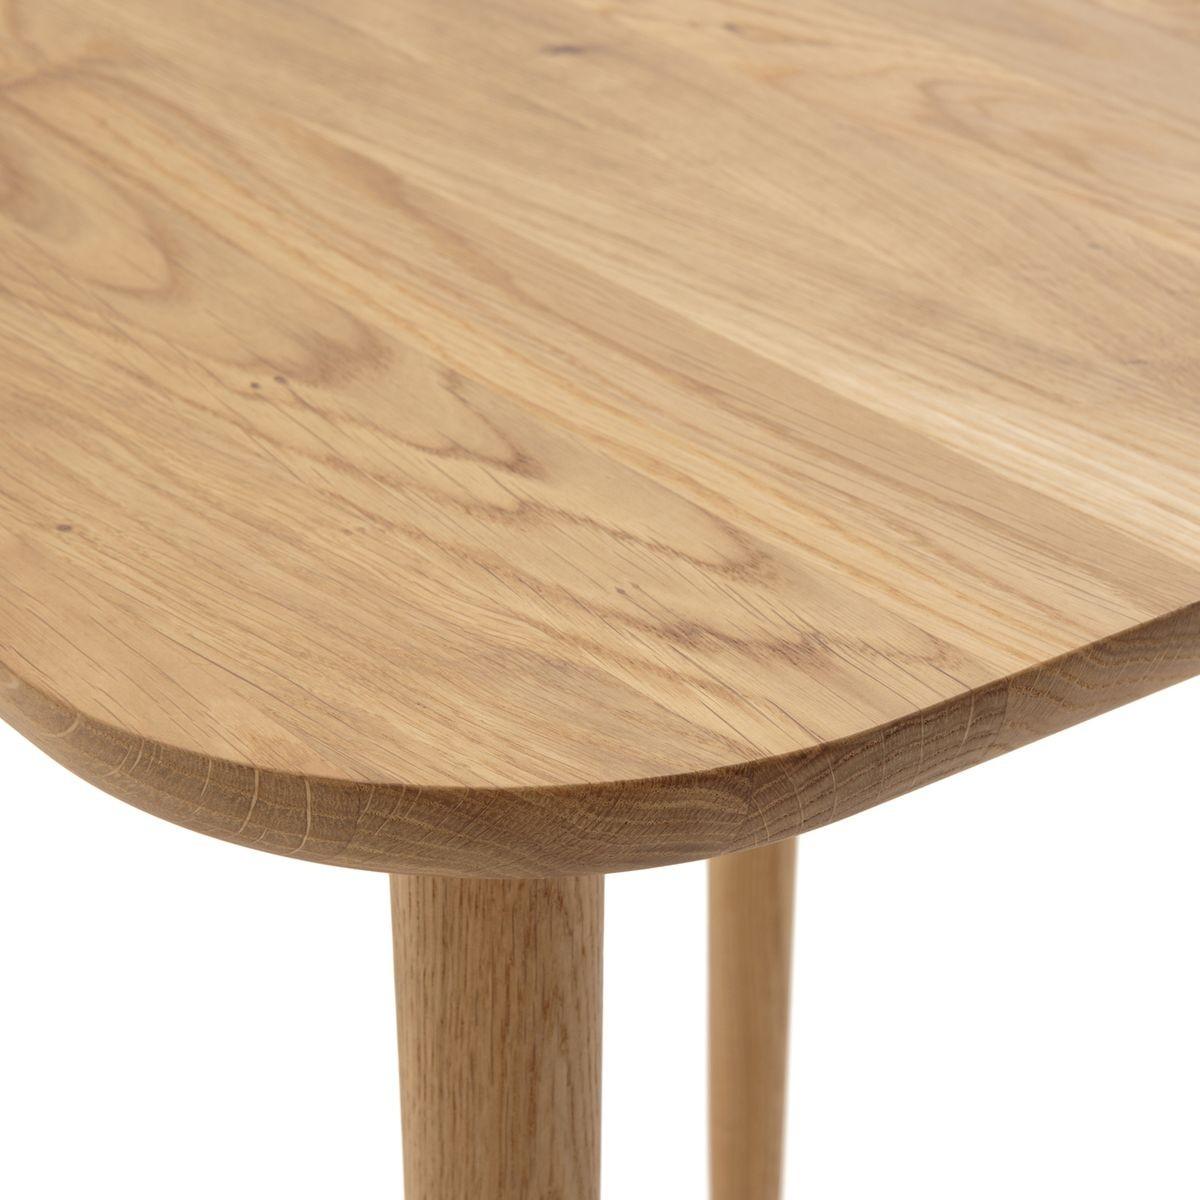 Basse Chêne Haute Table Carrée Crueso TailleUnique En W29EIHDY